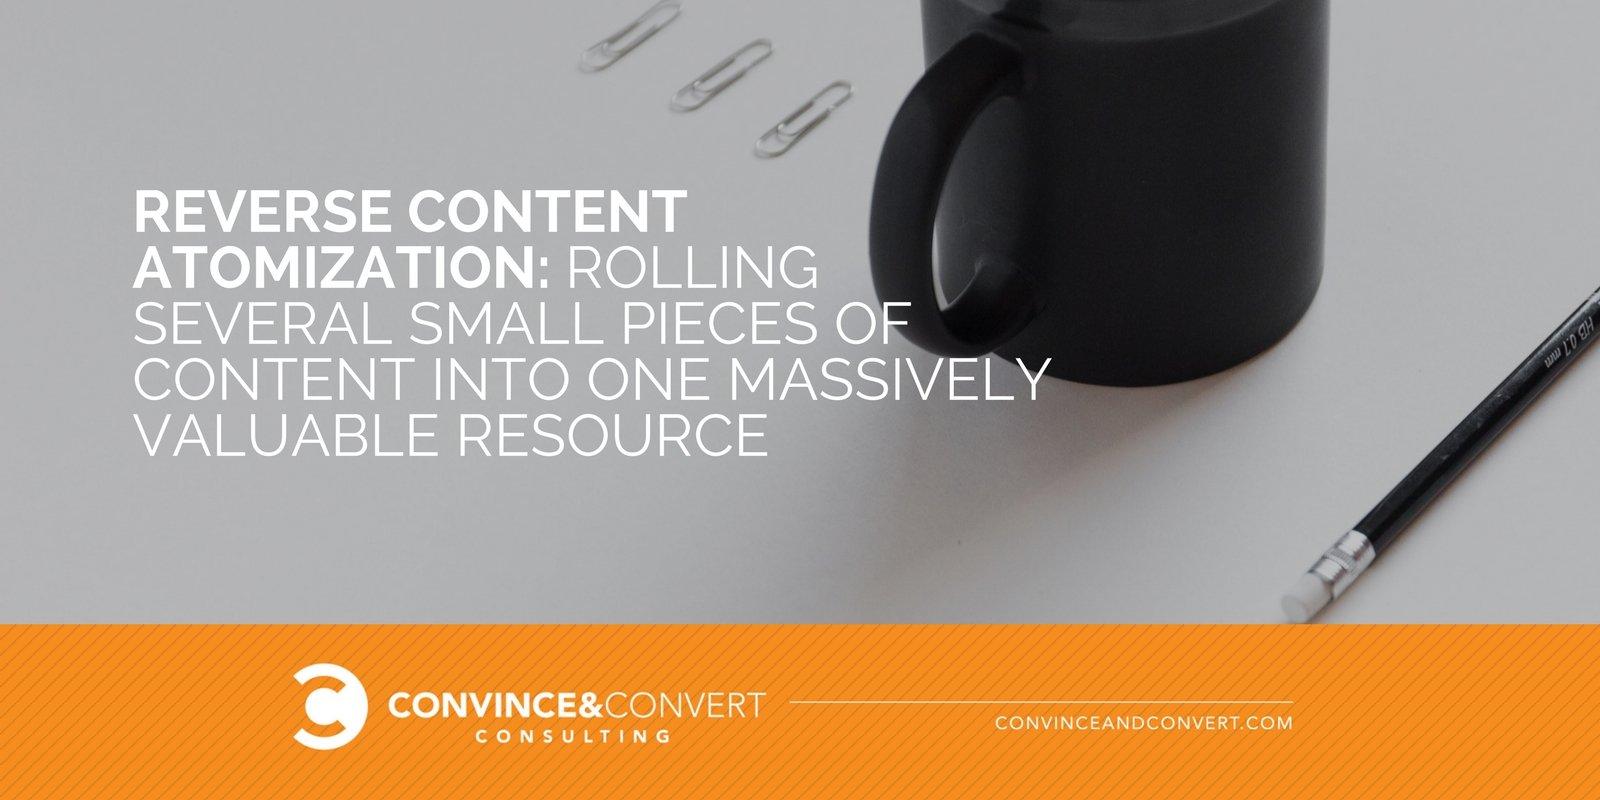 Reverse content atomization